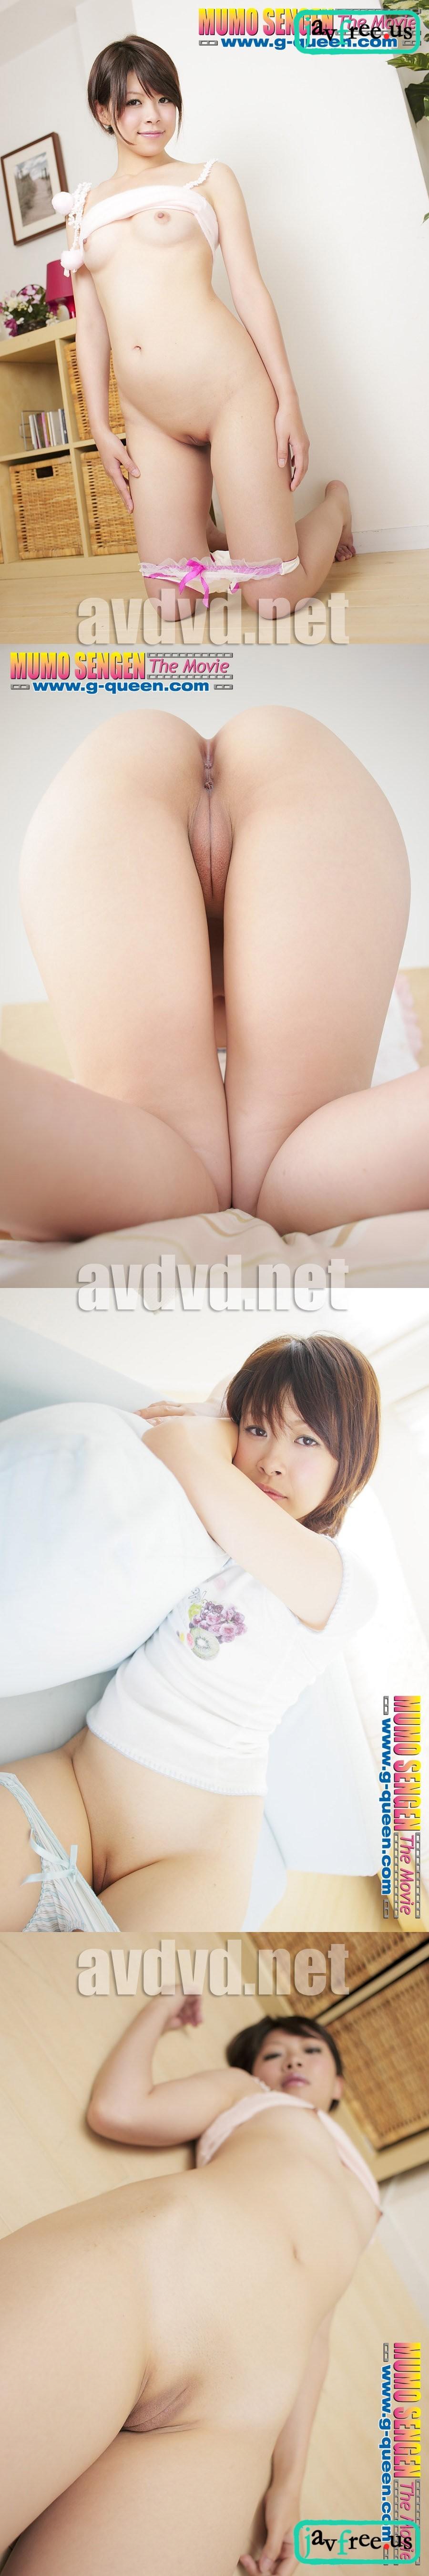 G Queen 無毛宣言 Vol. 284 : Mascarade   武内麻友(Mayu Takeuchi) 無毛宣言 武内麻友 Mayu Takeuchi G Queen